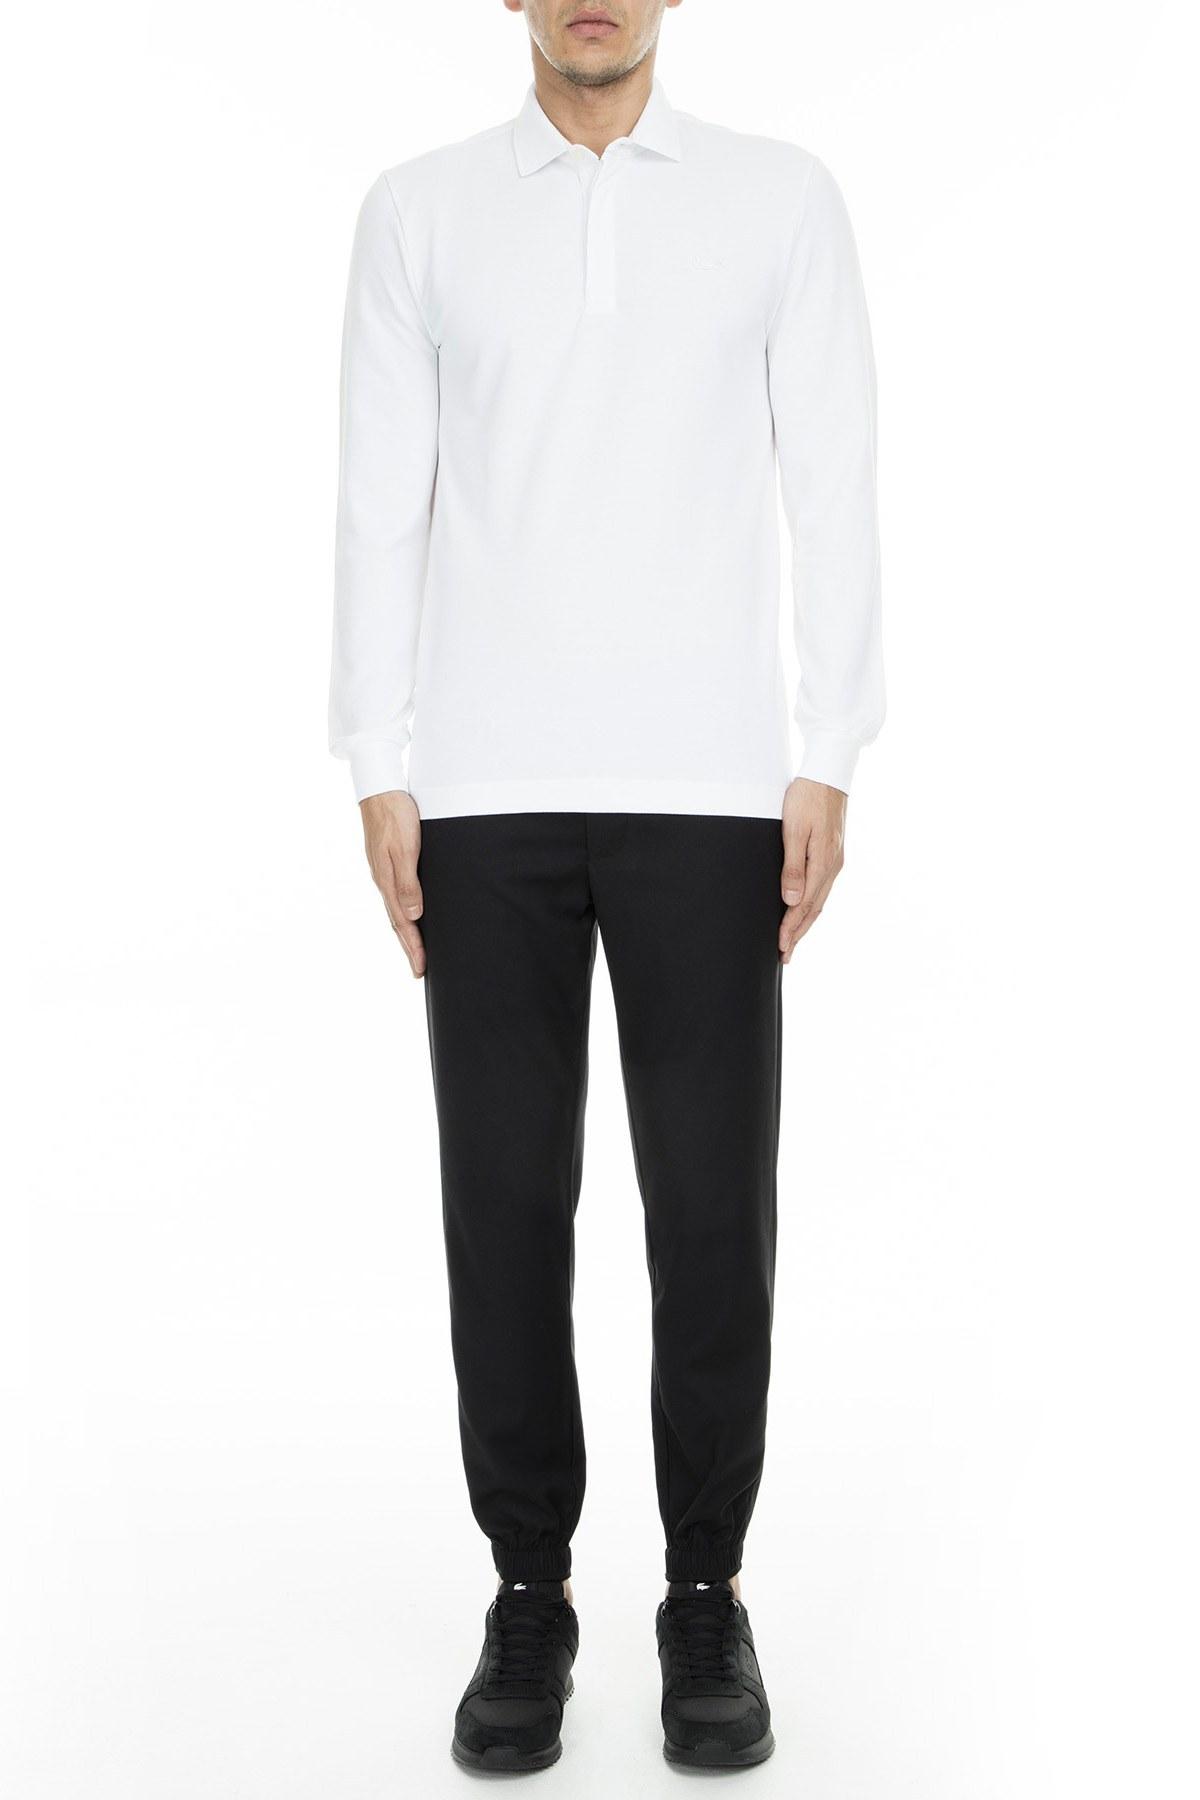 Lacoste T Shirt Erkek Polo PH2481 001 BEYAZ